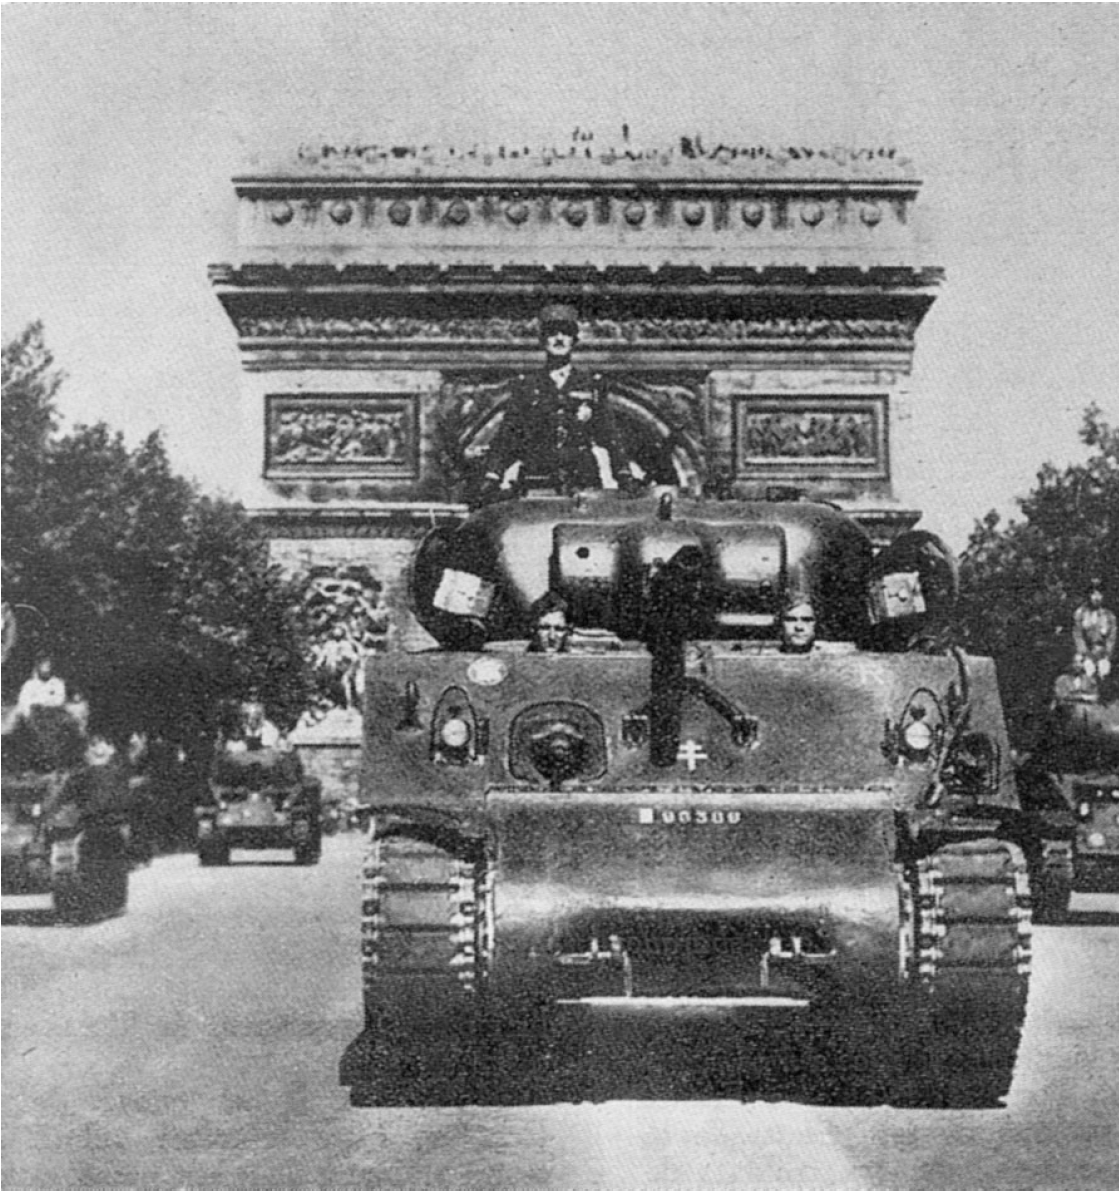 La 2e D.B. (août 1944)